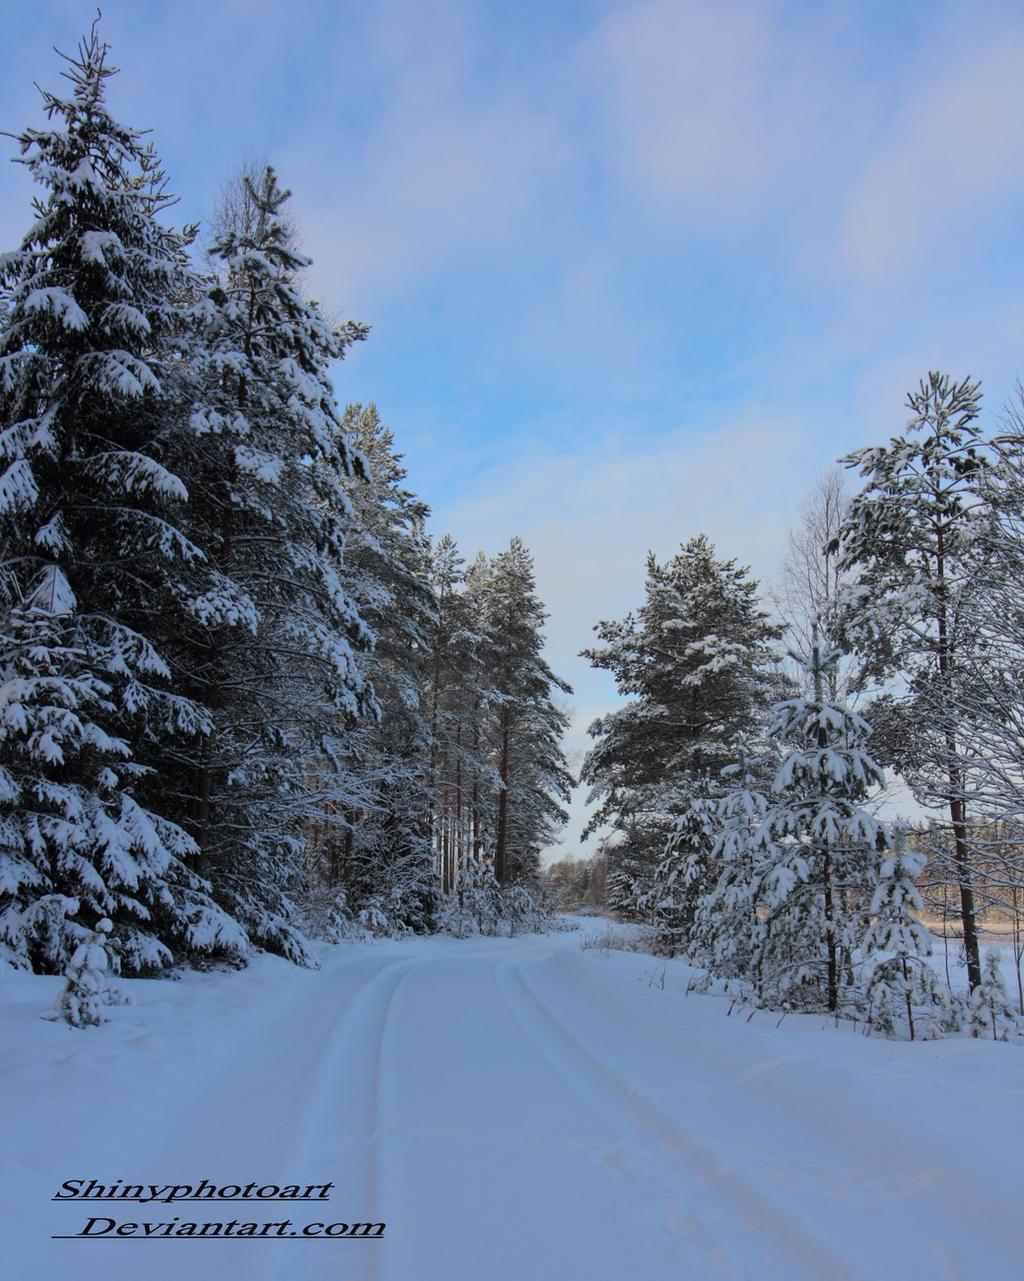 Snowy way by ShinyphotoArt